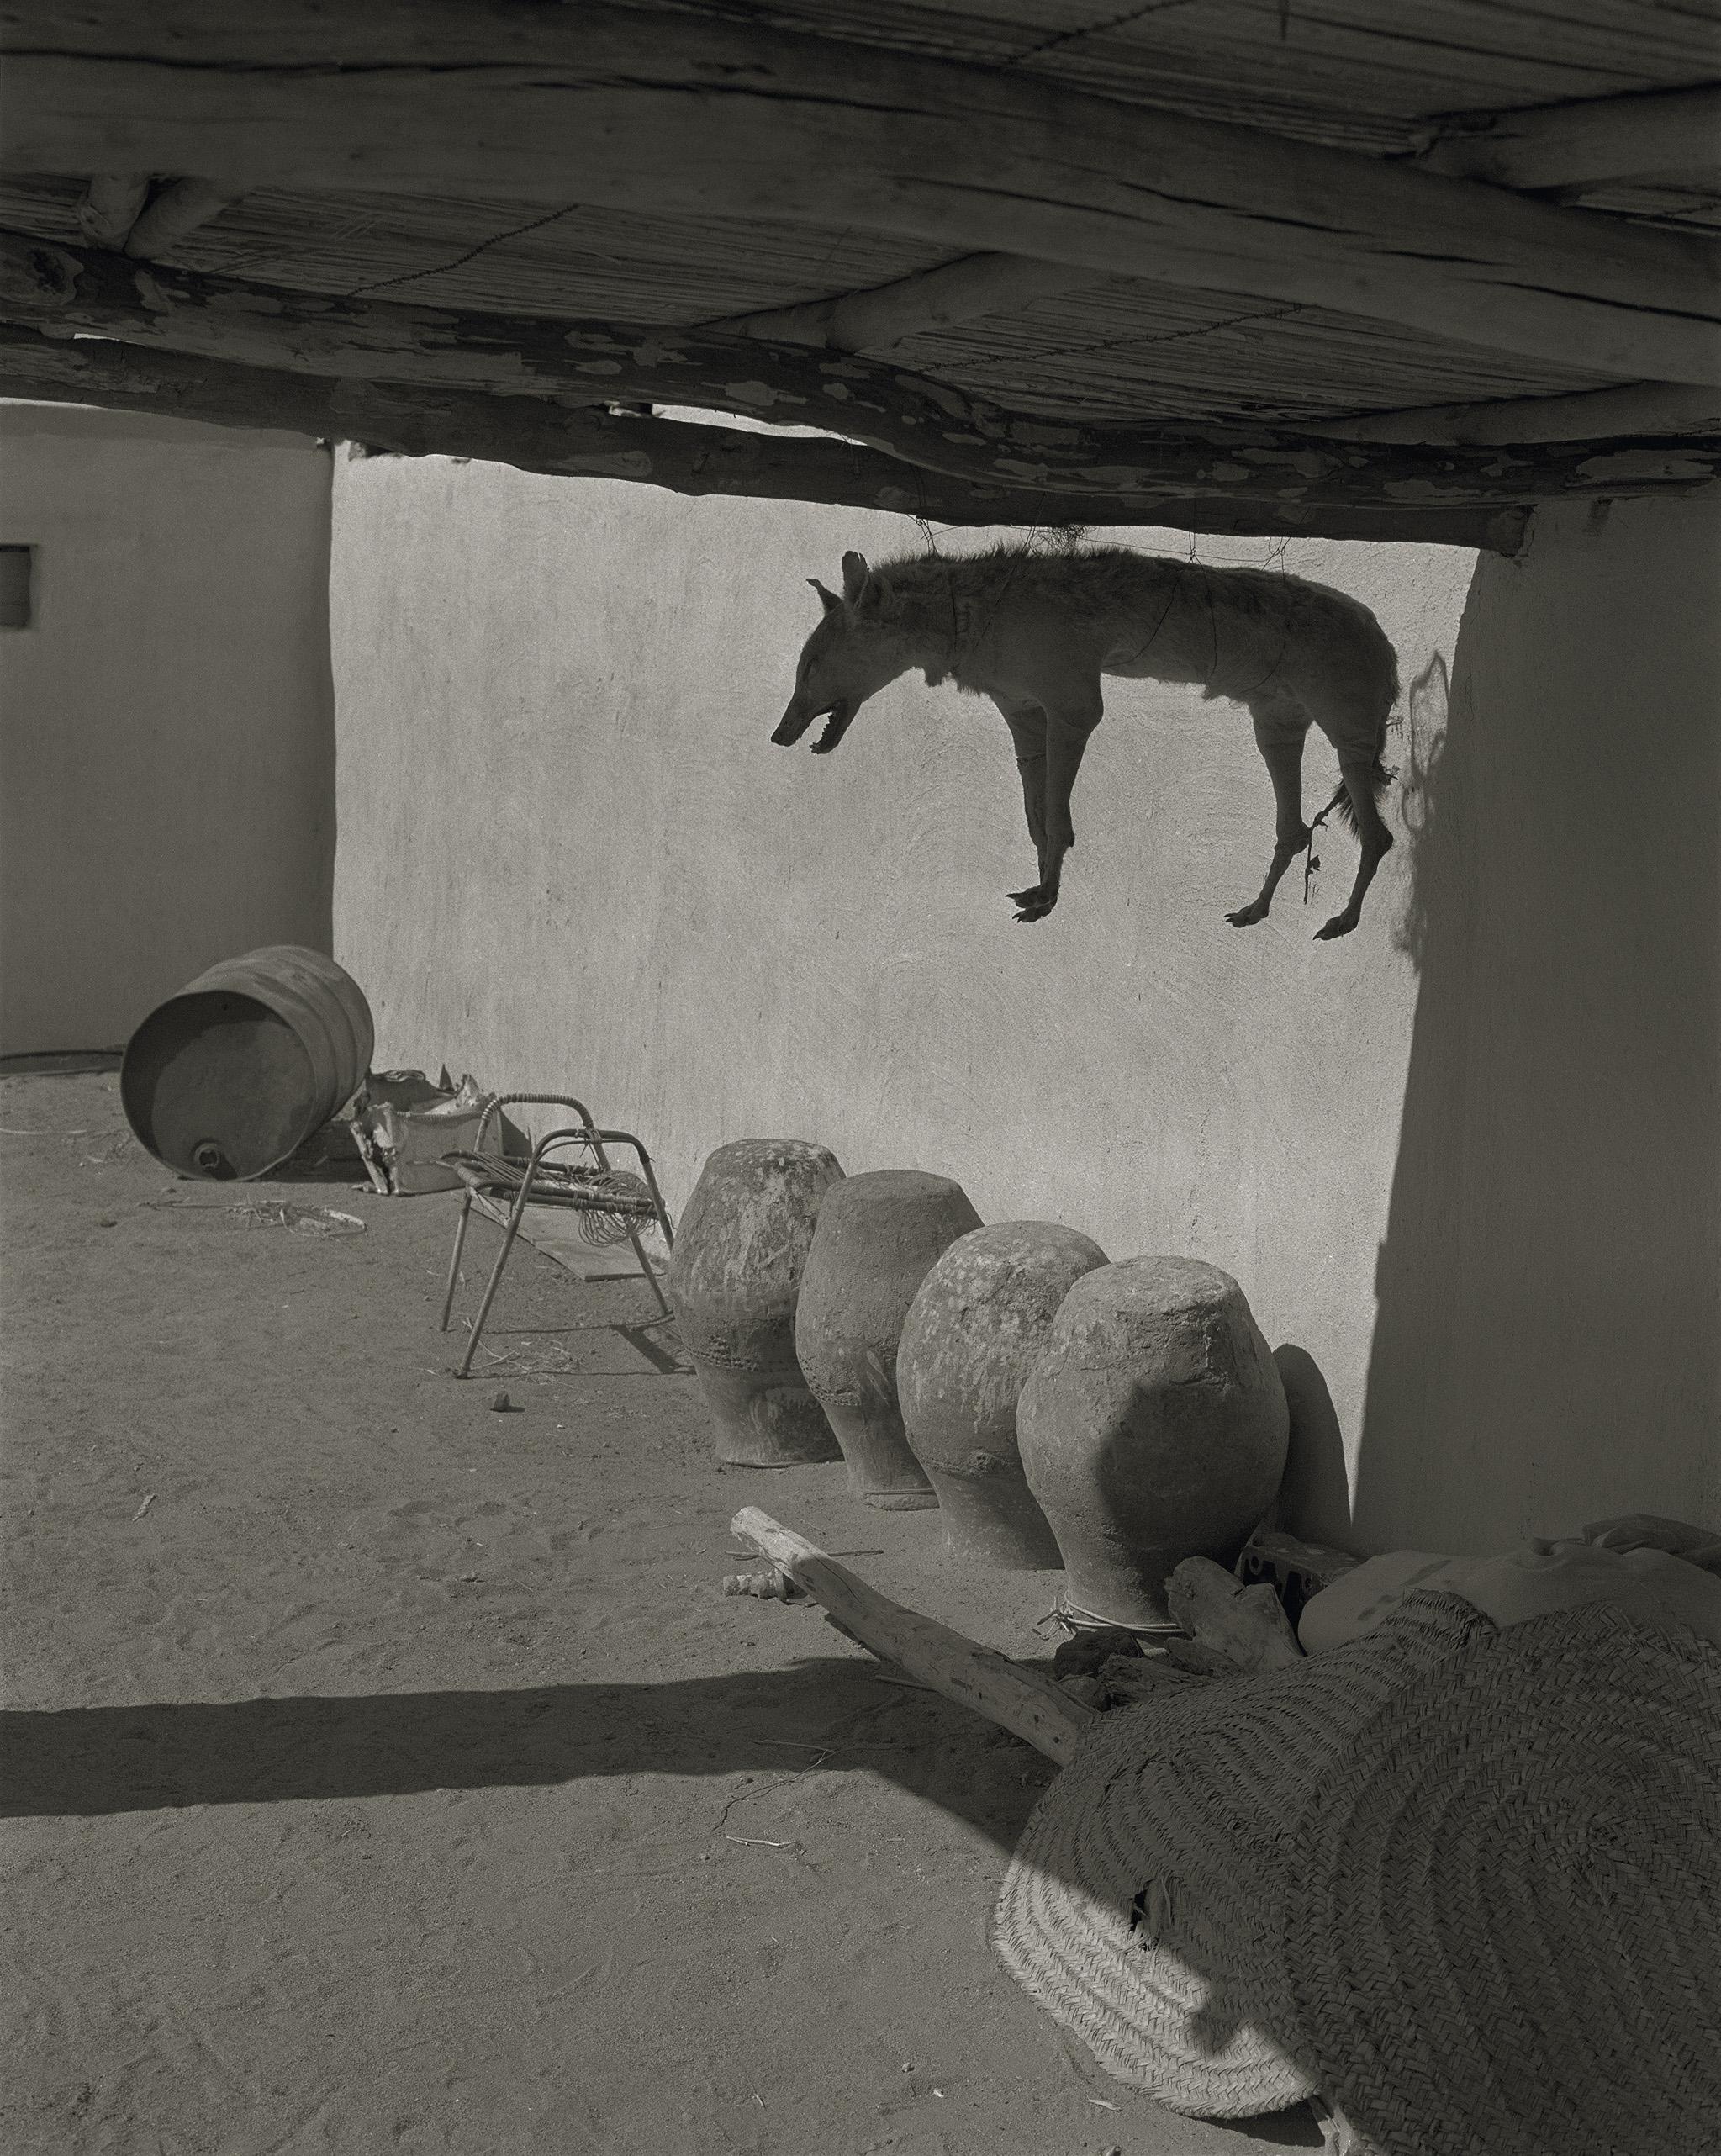 Claude Iverné, Naturalised dog, Toshka, Dar Sukkott, Nubia, Feb. 2002. Pas-de-Calais, 2016